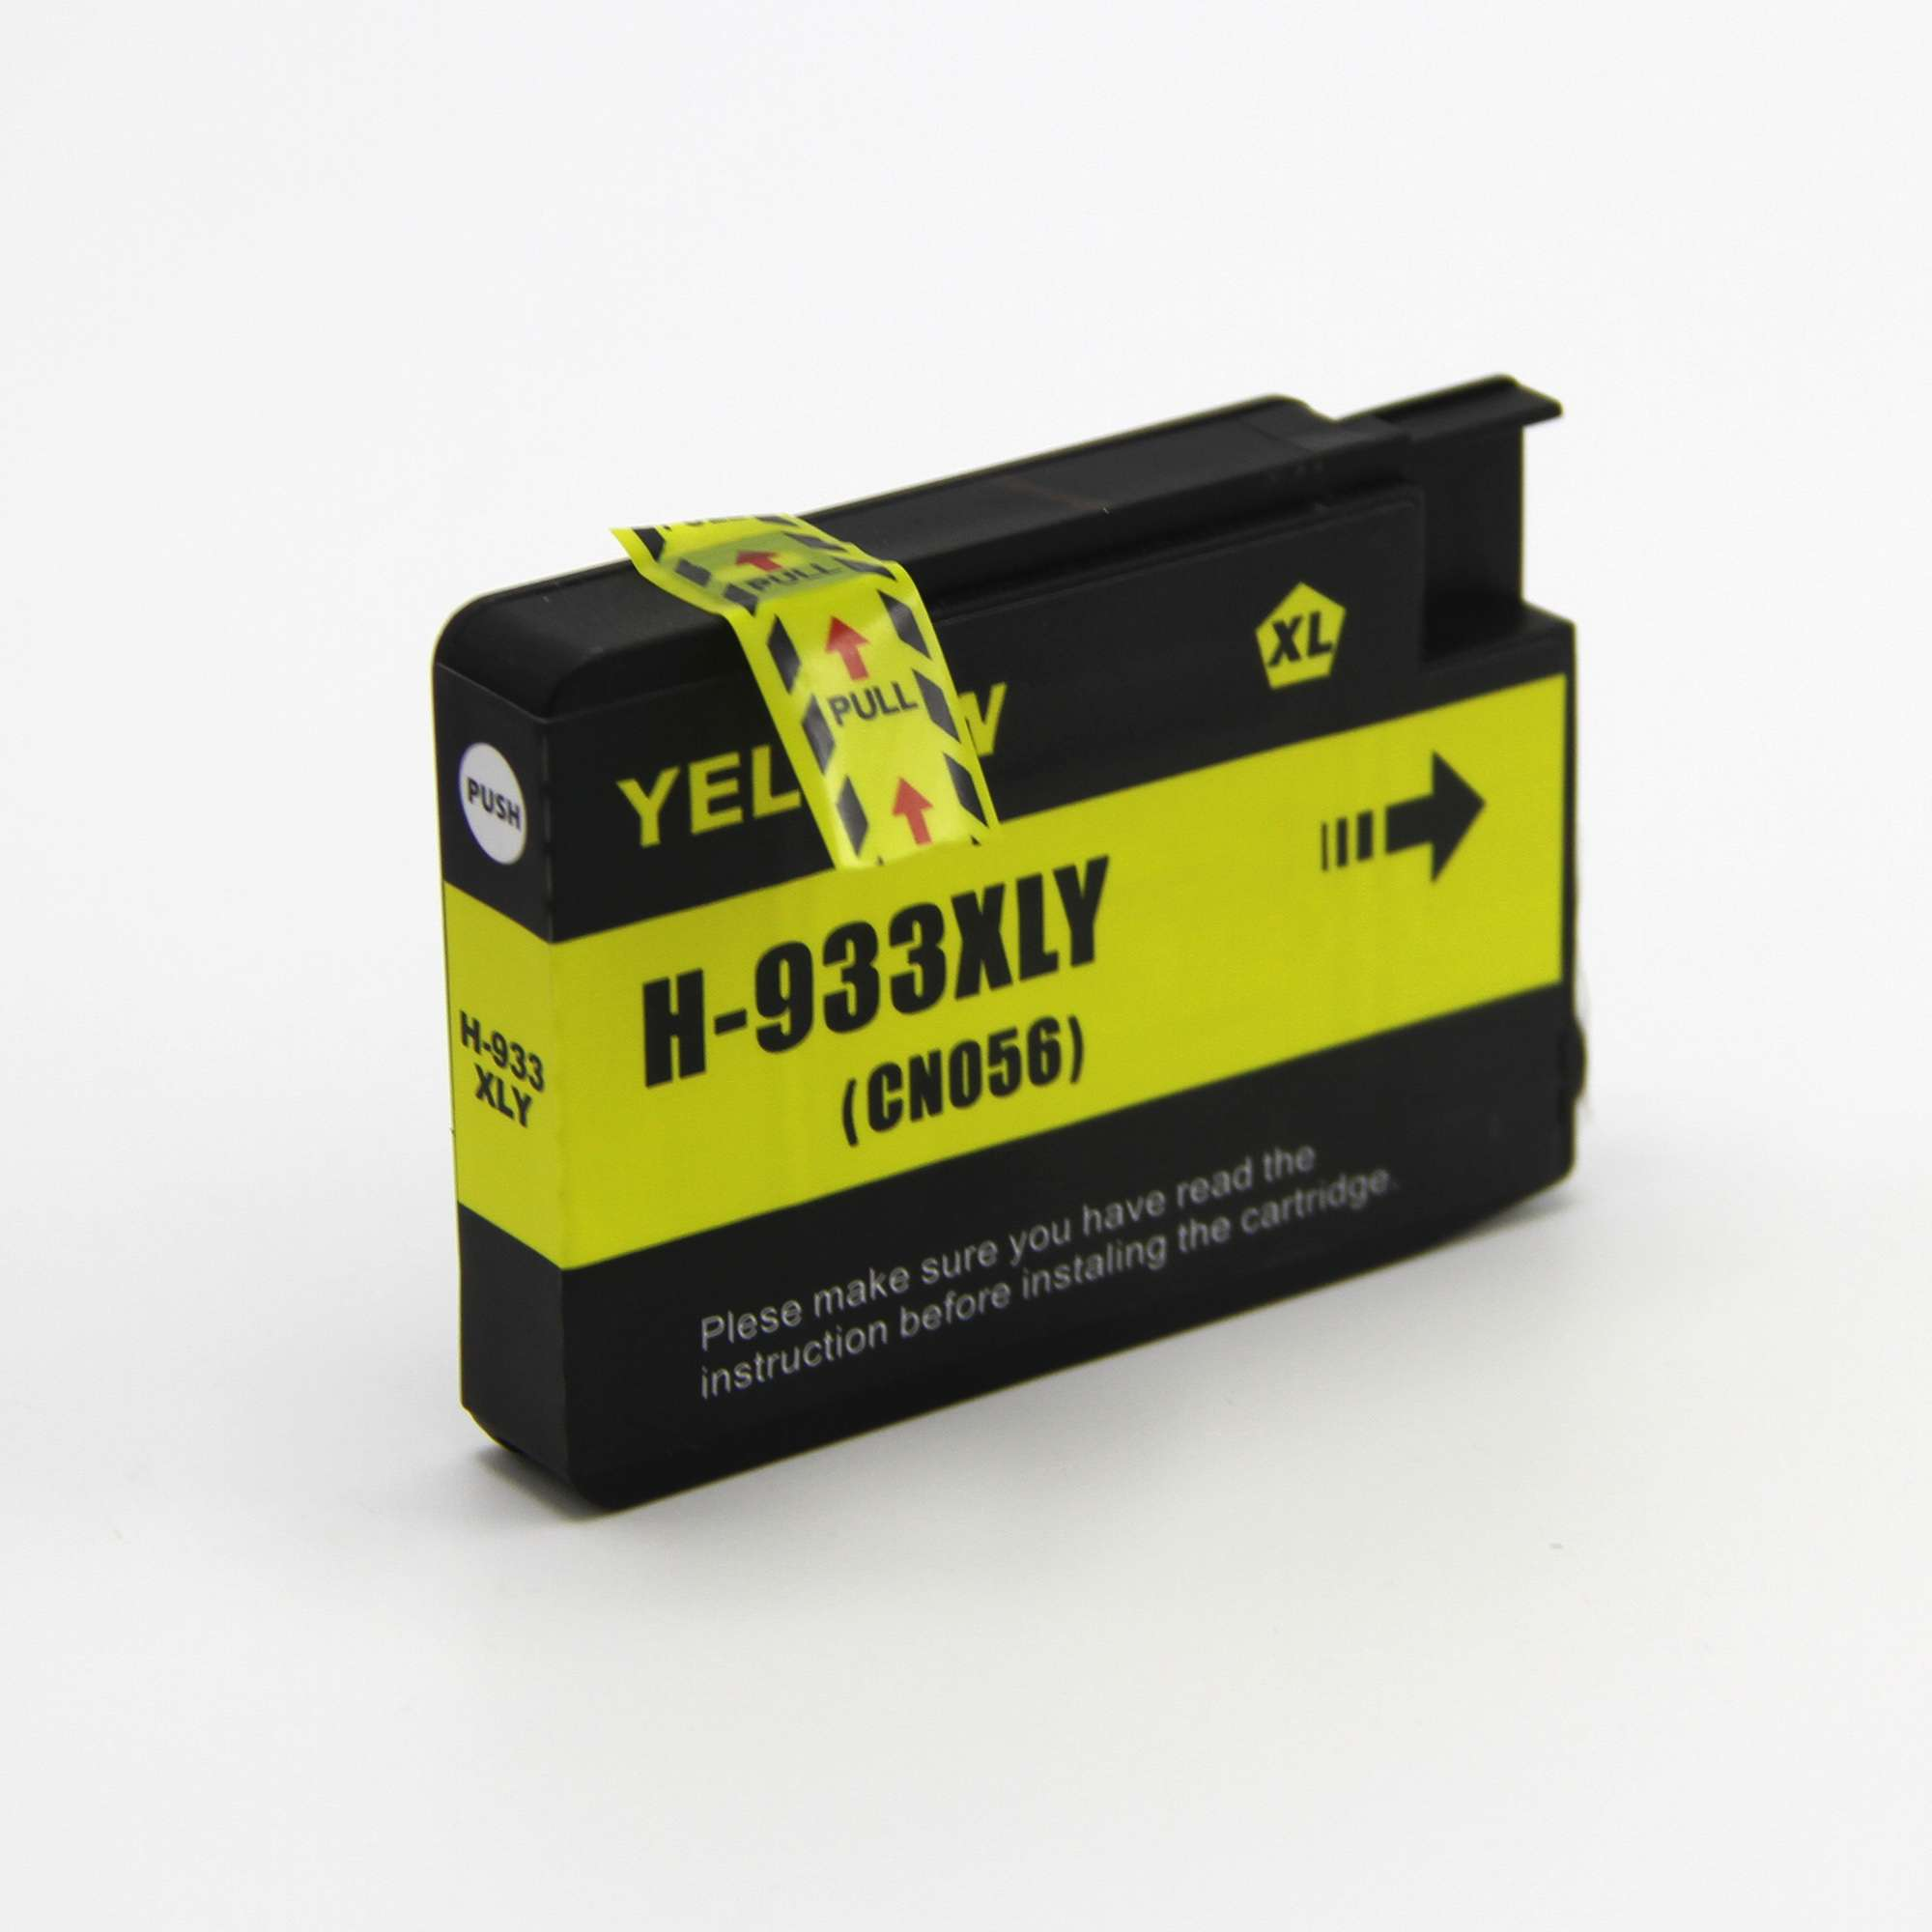 HP H-933XLY Yellow Ink Cartridge